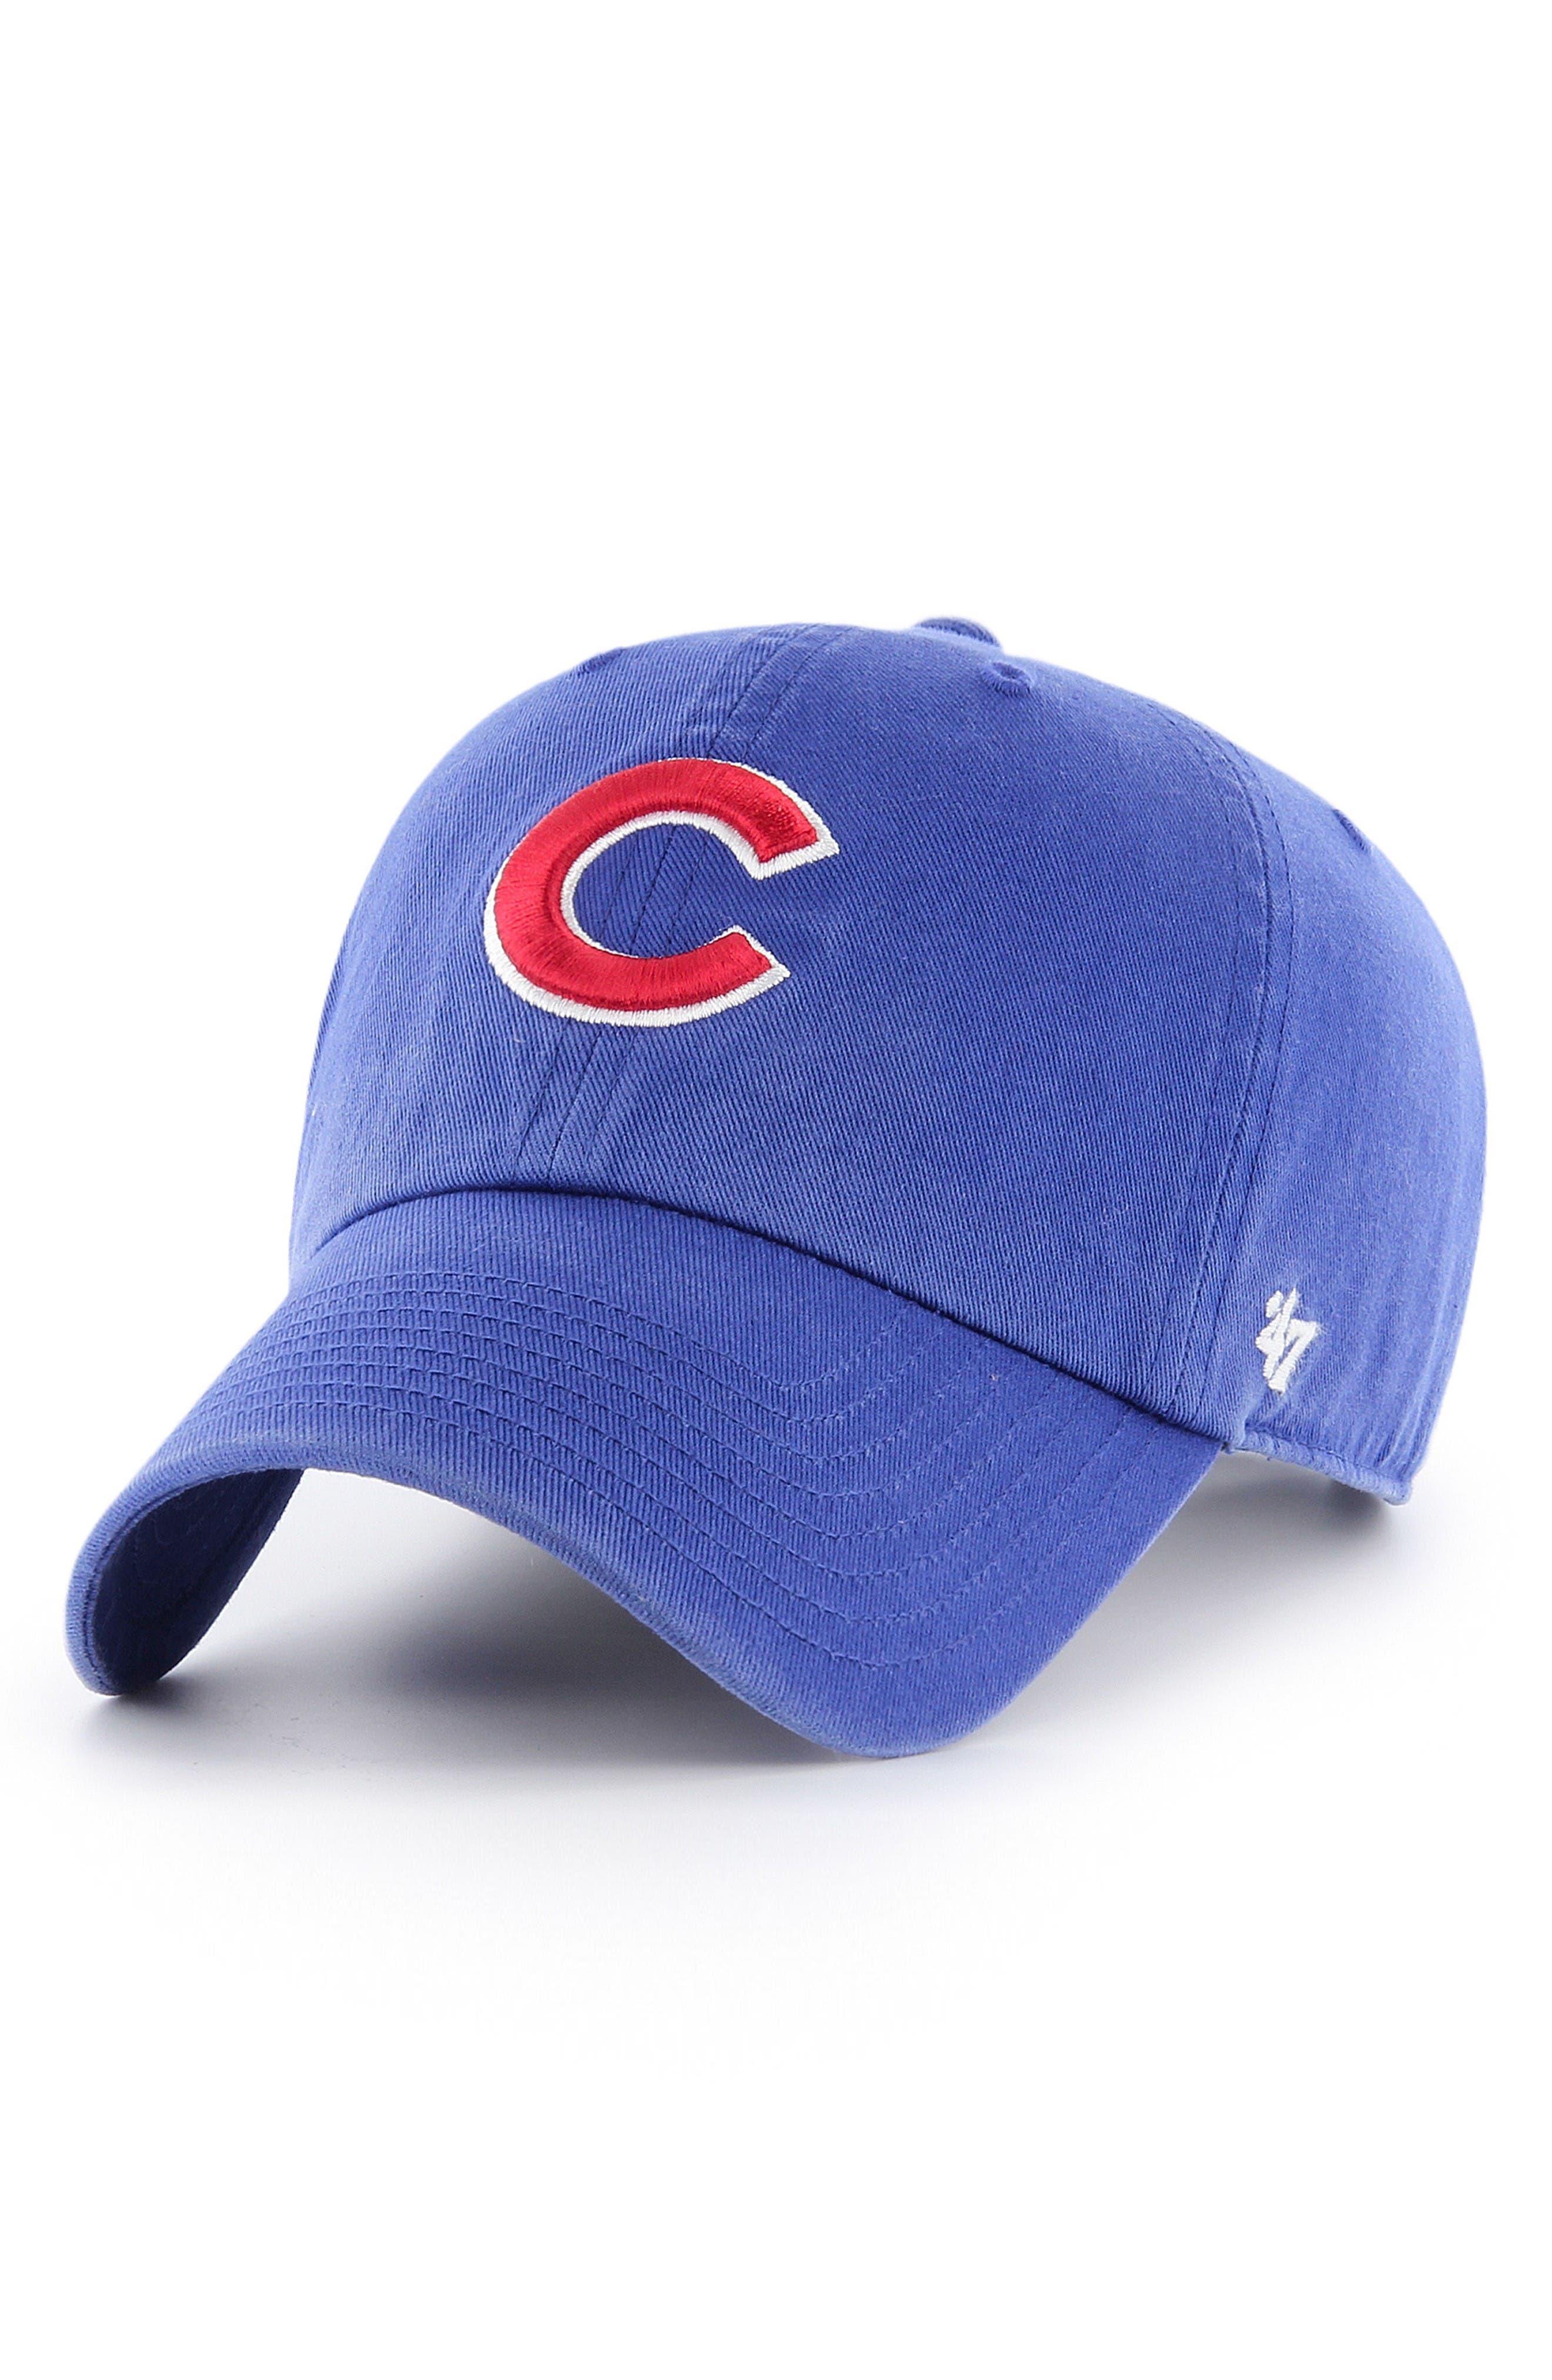 Main Image - '47 Clean Up - Chicago Cubs Baseball Cap